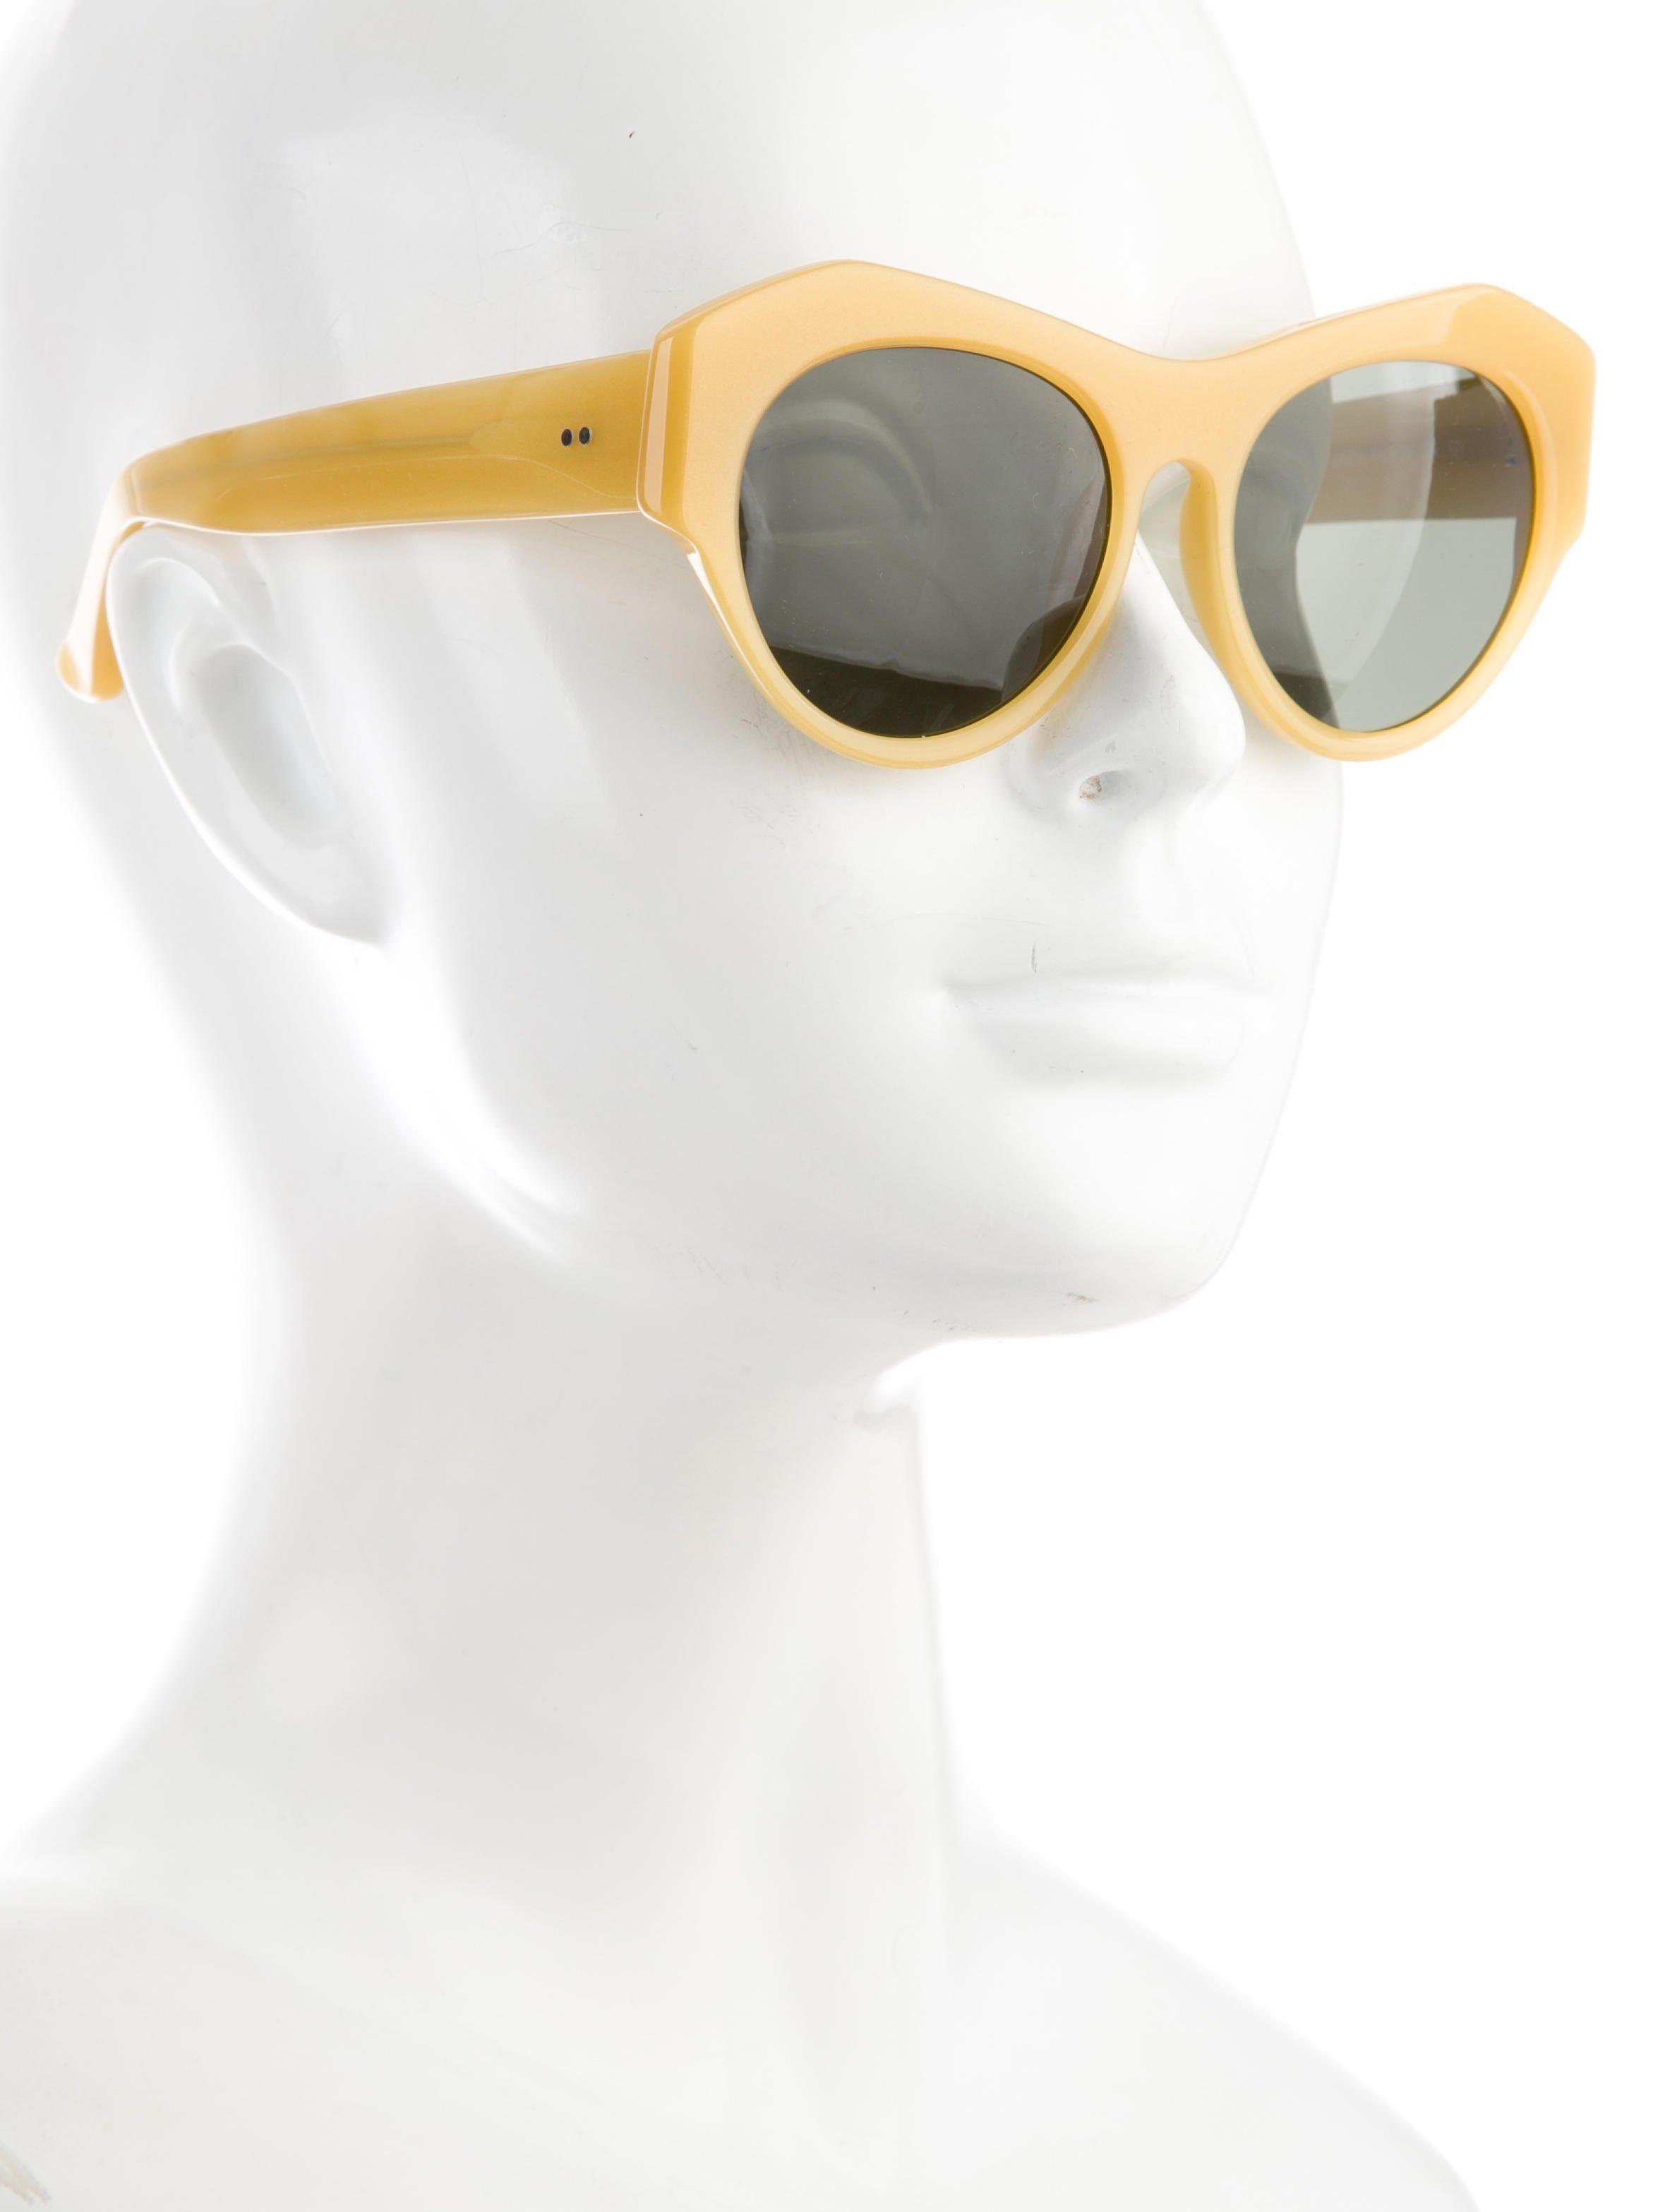 5e853c33f4aa Yellow acetate Linda Farrow for Dries Van Noten round sunglasses with  tinted lenses.